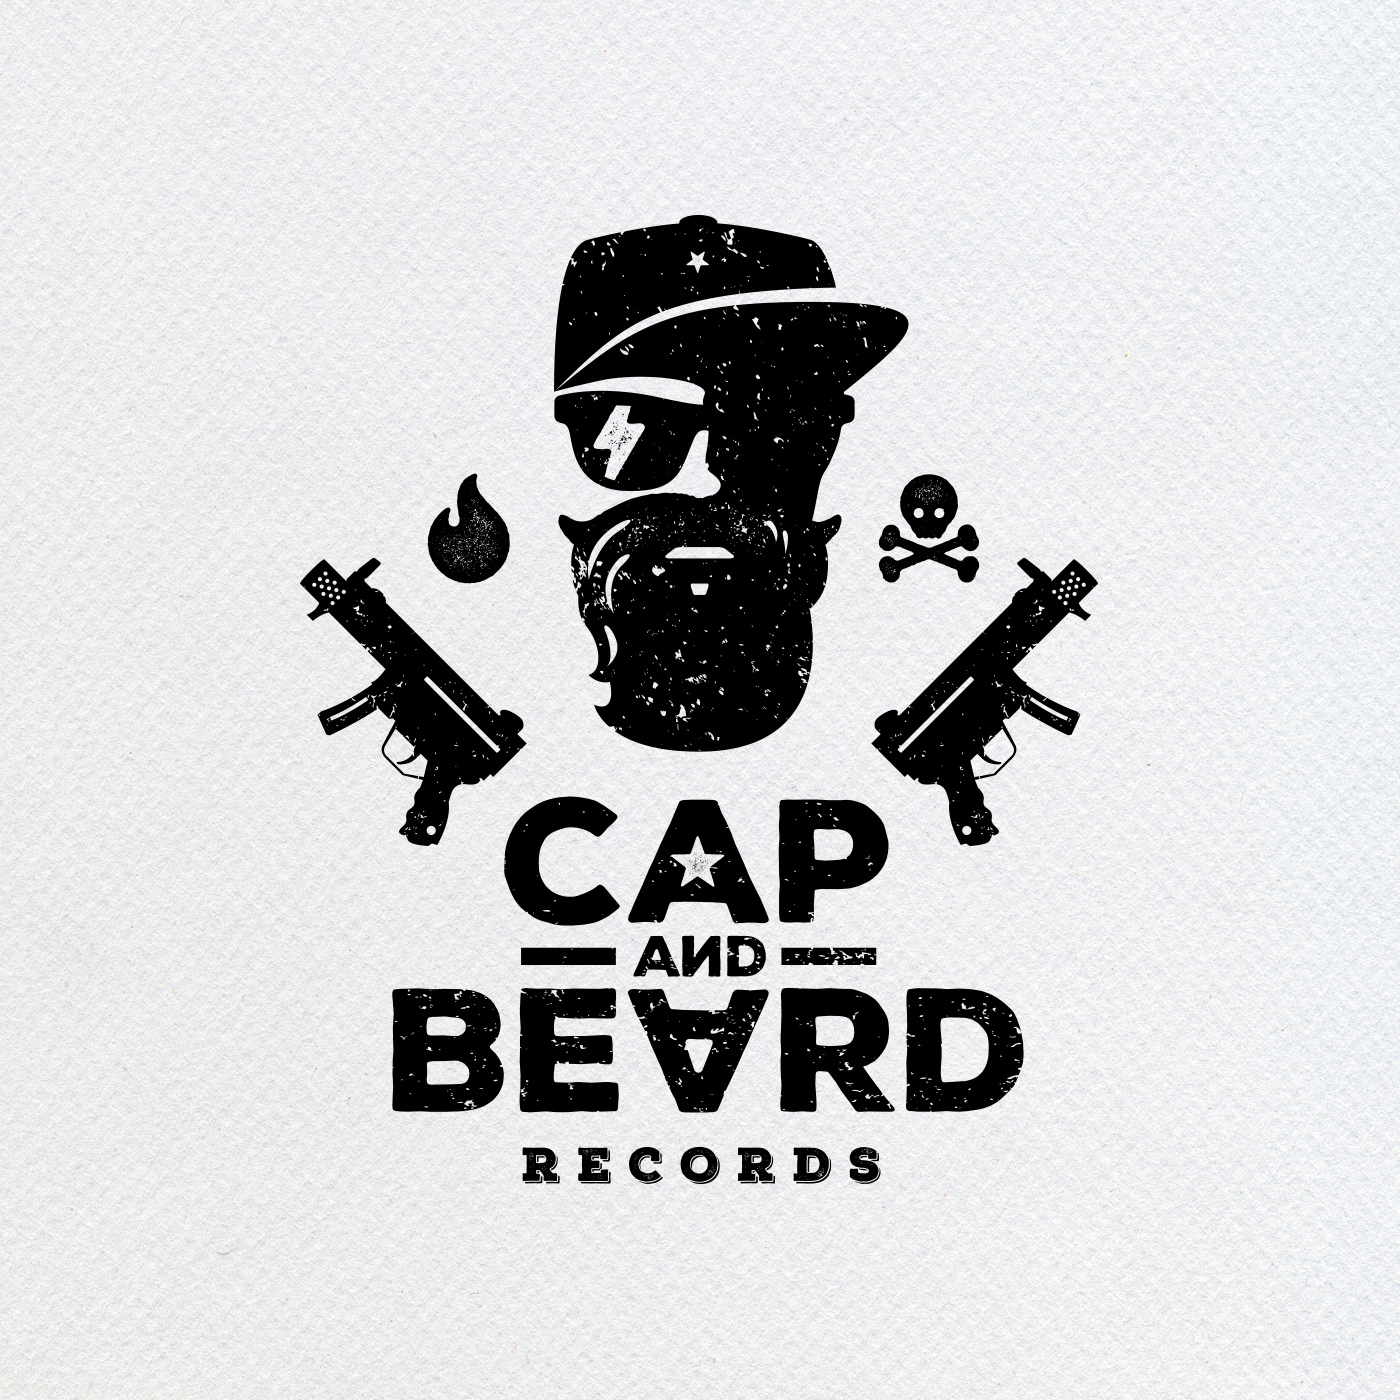 Alexey Zinoviev graphic design - Cap   Beard logo 66b3eb639a7